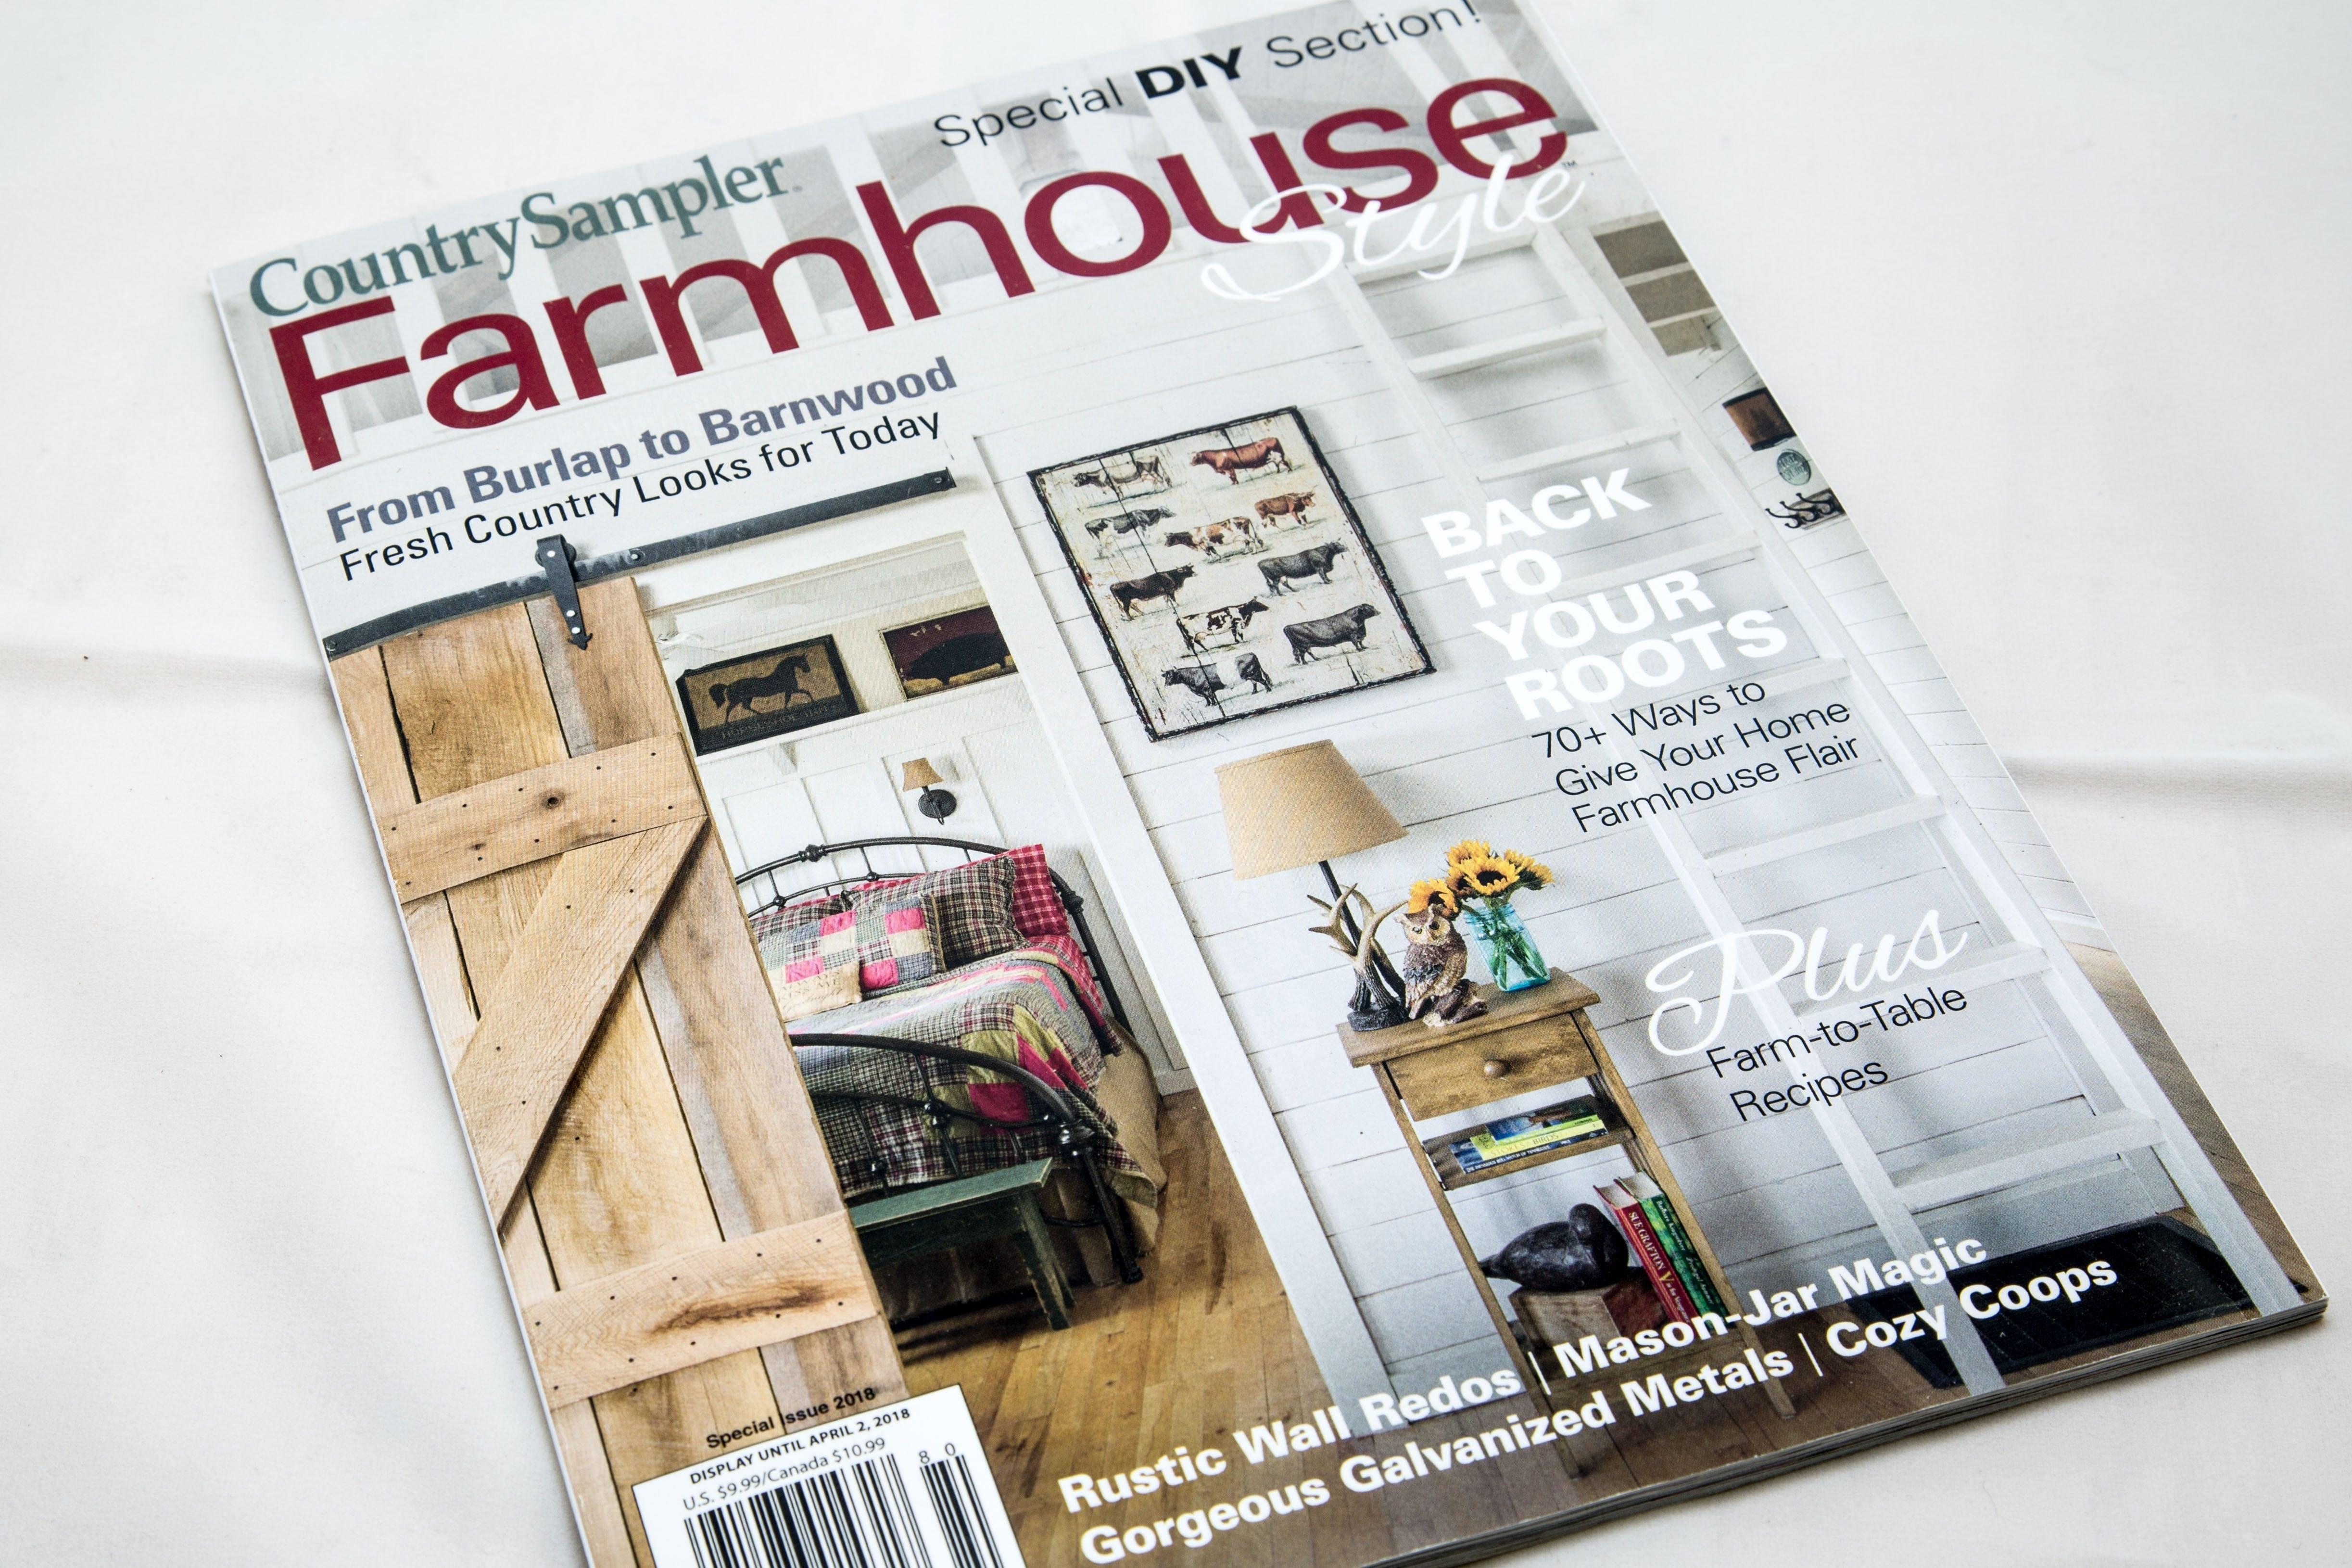 Country Sampler Farmhouse Style Porter Barn Wood